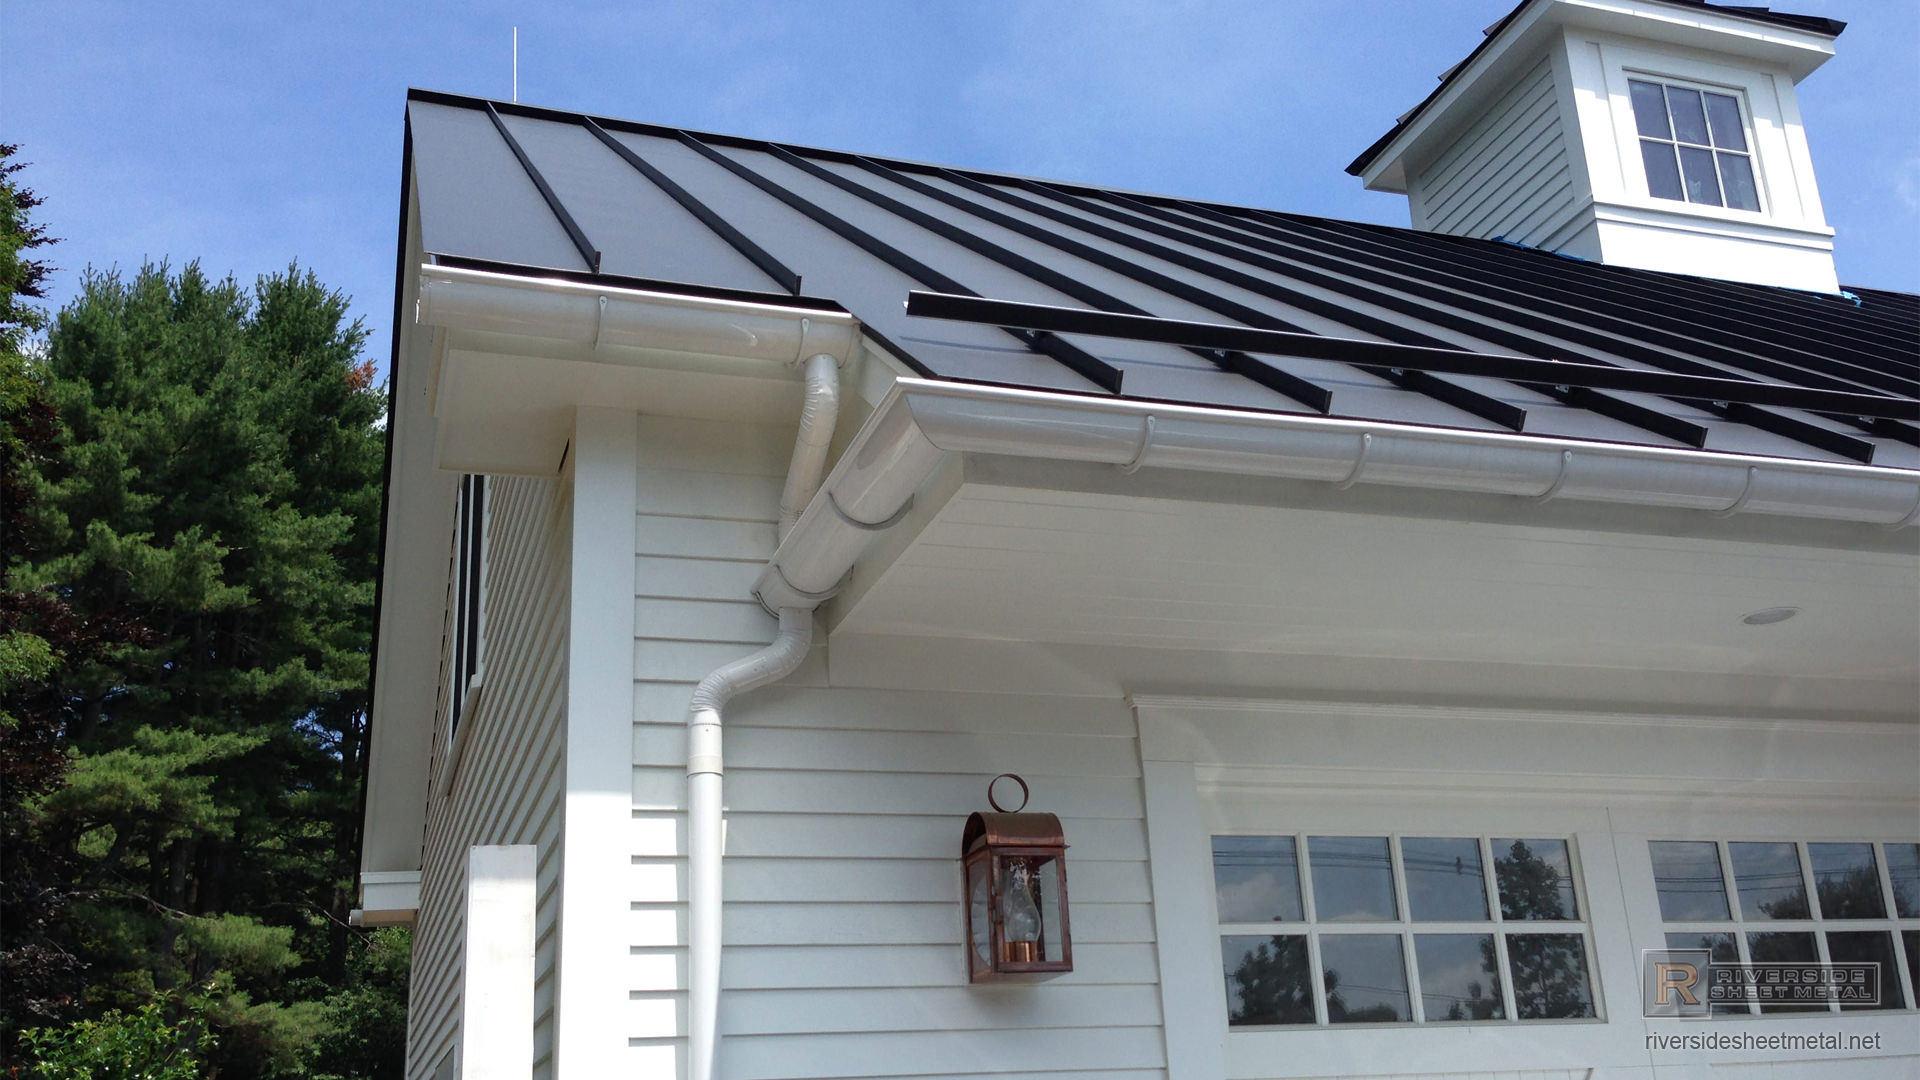 Matte Black Aluminum Roofing With Colorgard Snow Retention